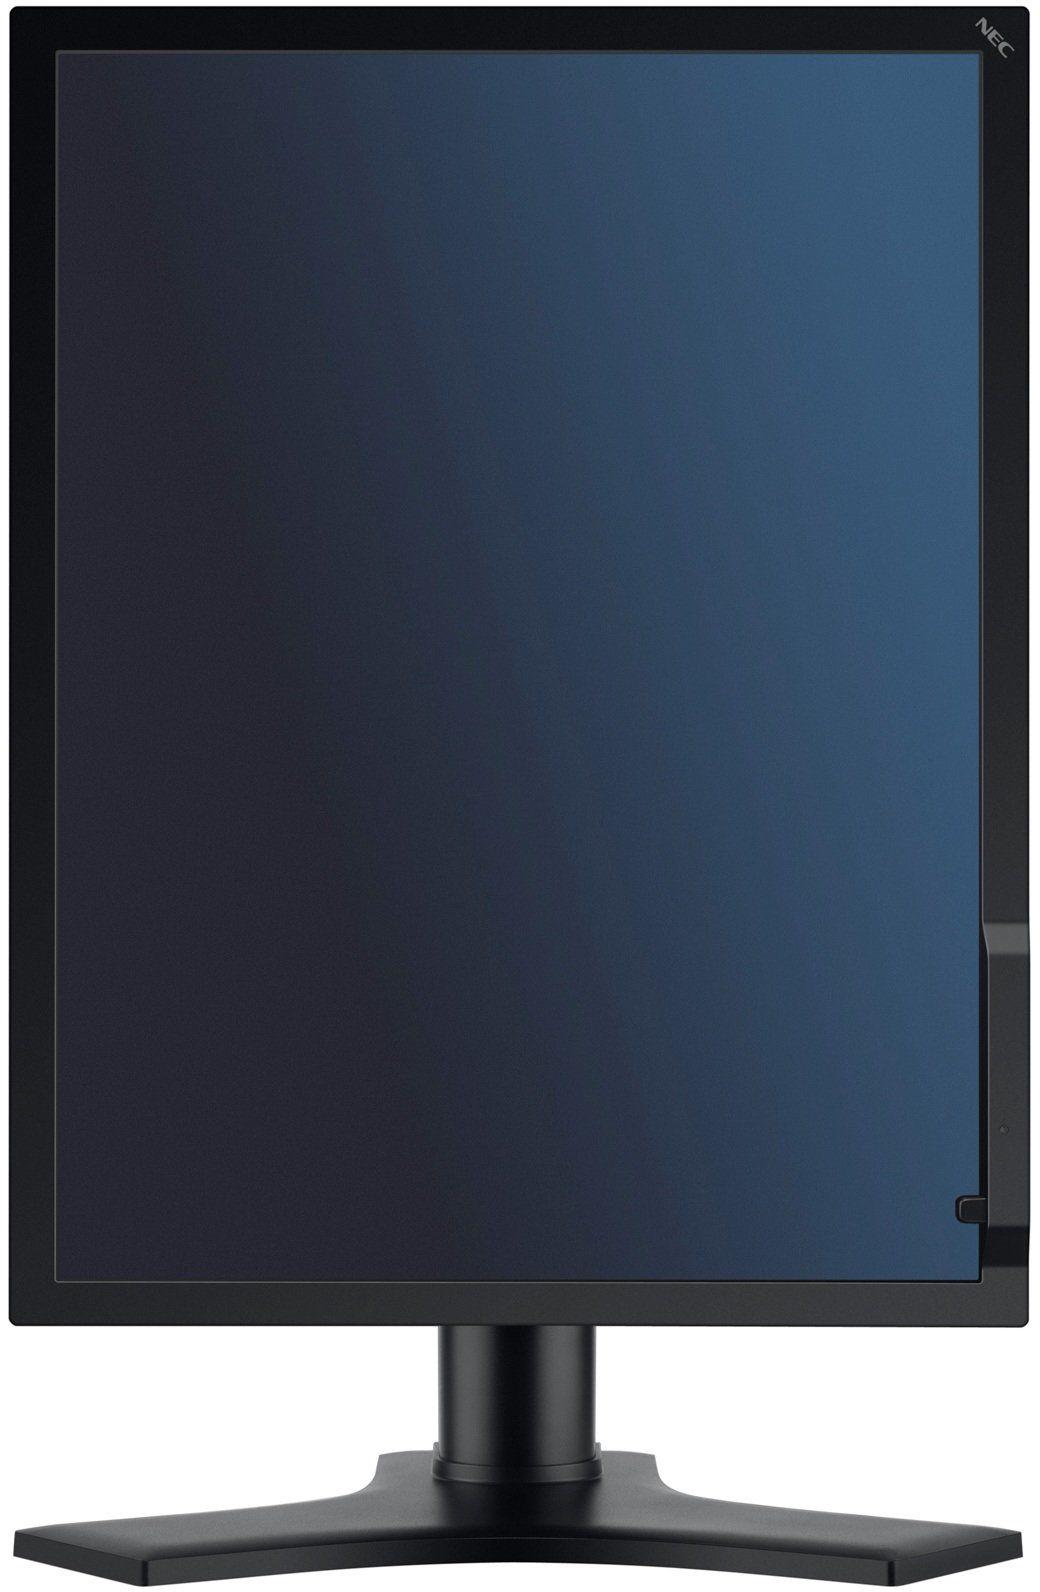 "NEC MD213MC monitor komputerowy 54,1 cm (21,3 cala) Full HD czarny - ekrany komputerowe (54,1 cm (21,3""), 2048 x 1536 pikseli, Full HD, LCD, 24 ms, czarny)"